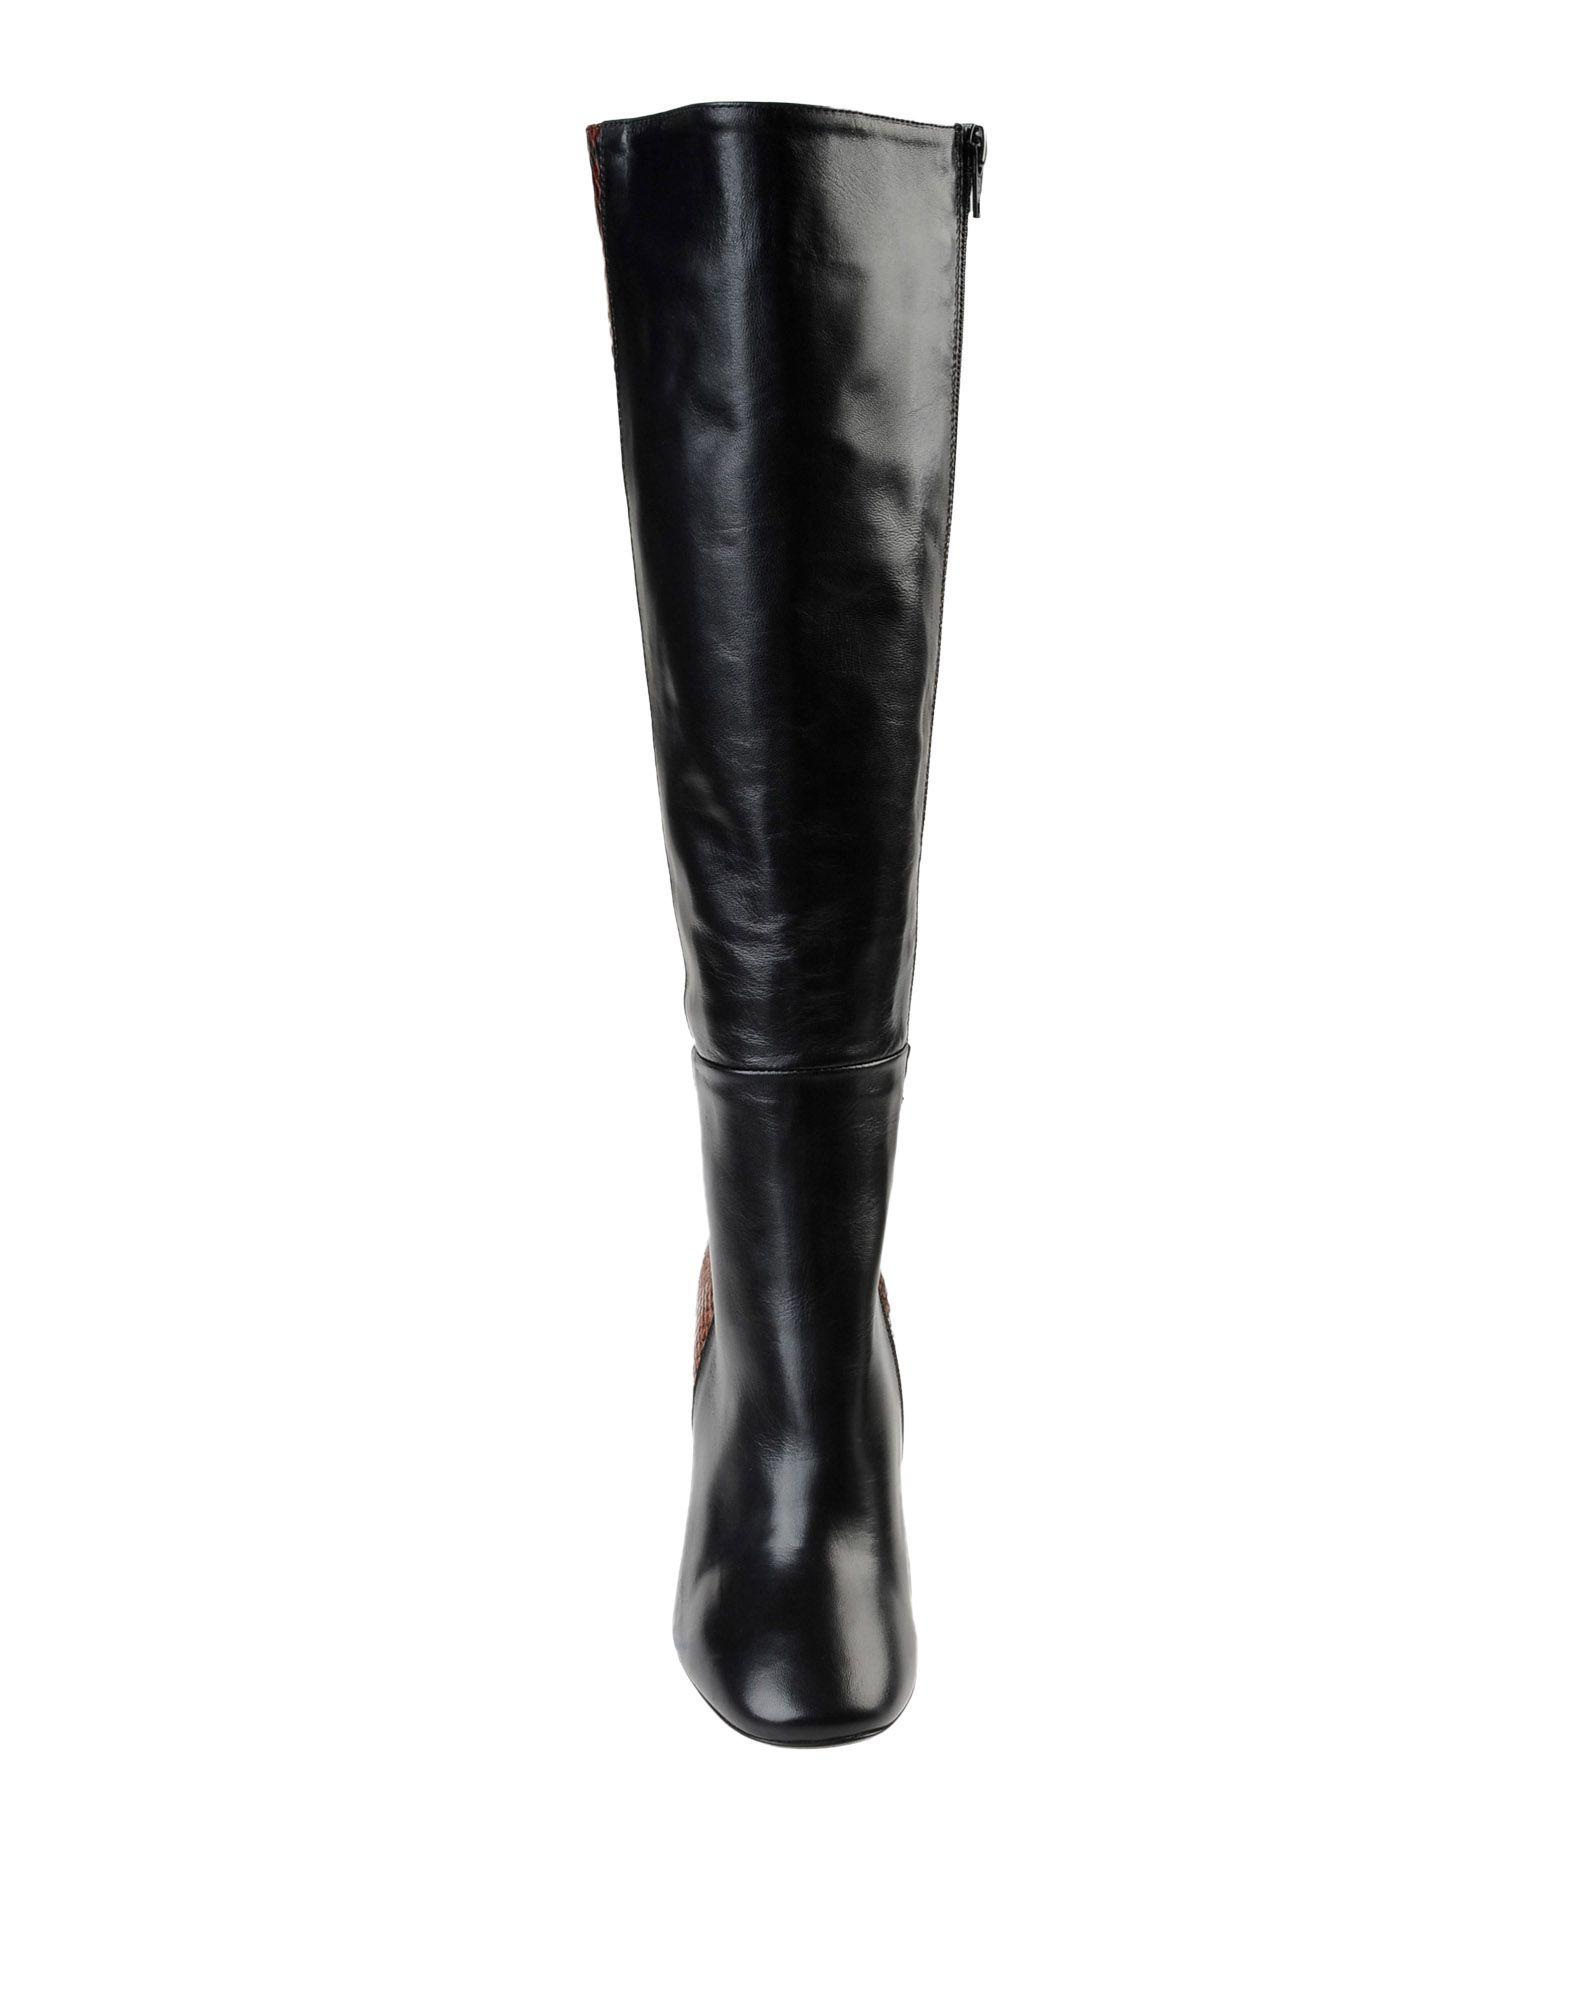 Jolie By Edward Spiers Stiefel Damen    11536489AJGut aussehende strapazierfähige Schuhe 2f0b4e